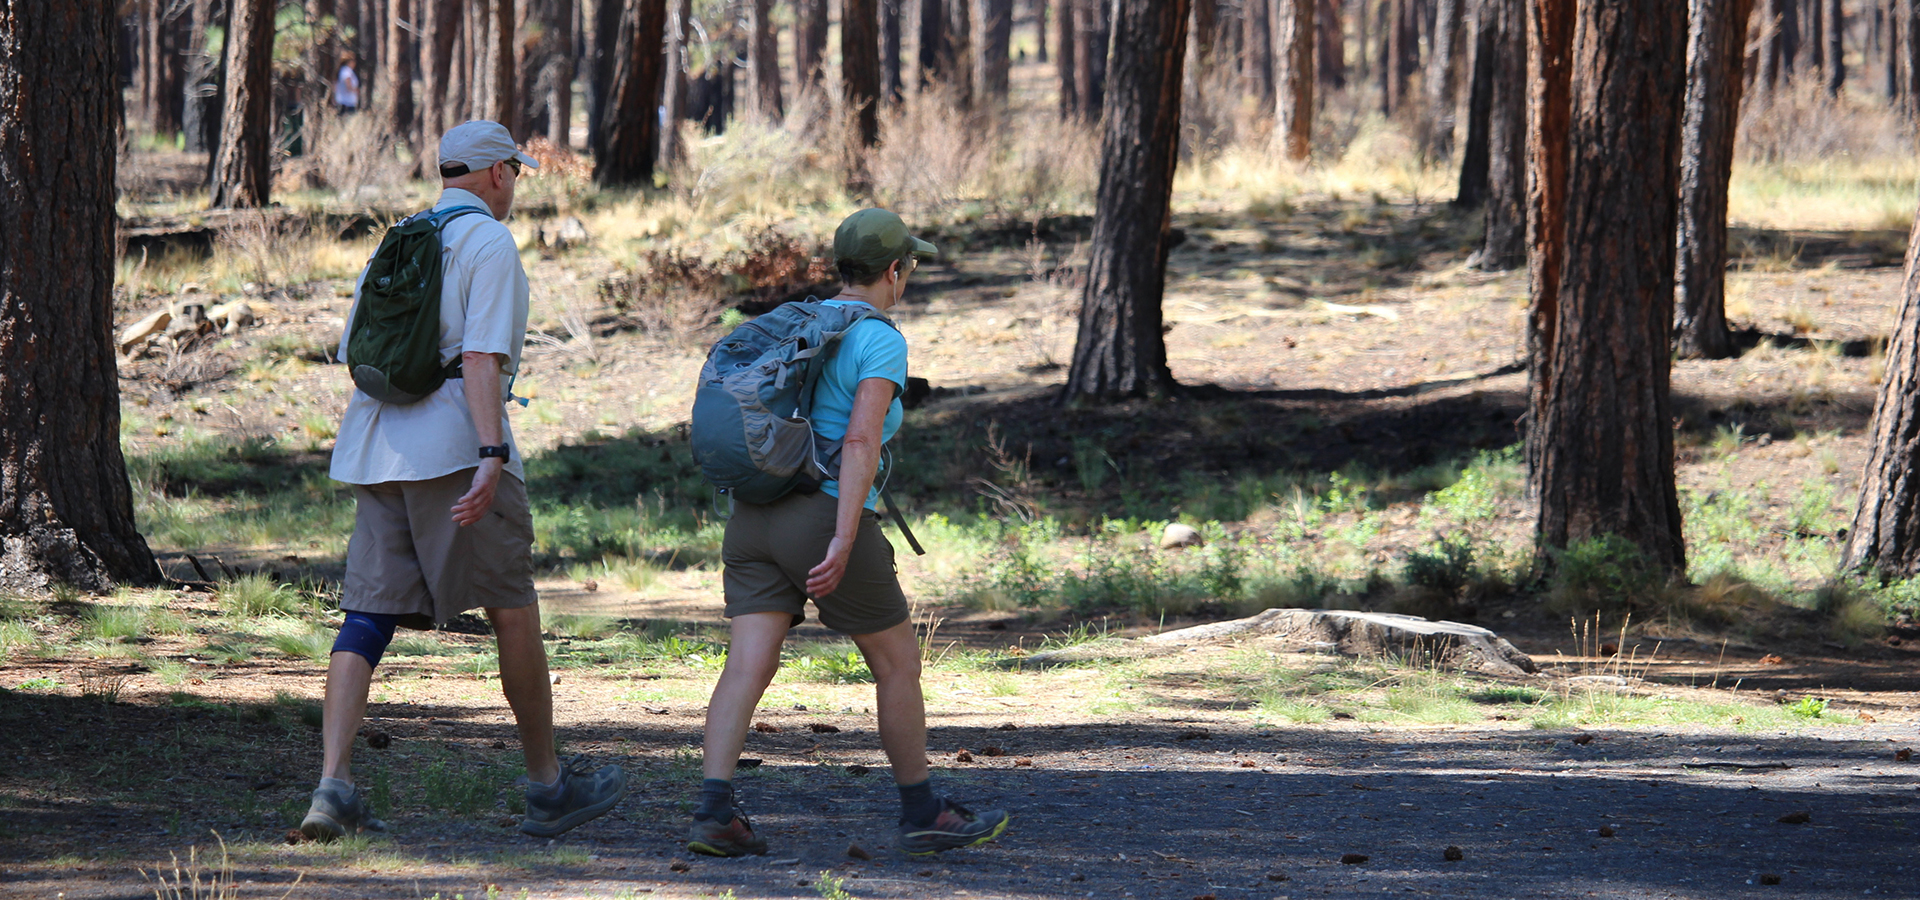 Shevlin-Park-Hiking-in-Bend